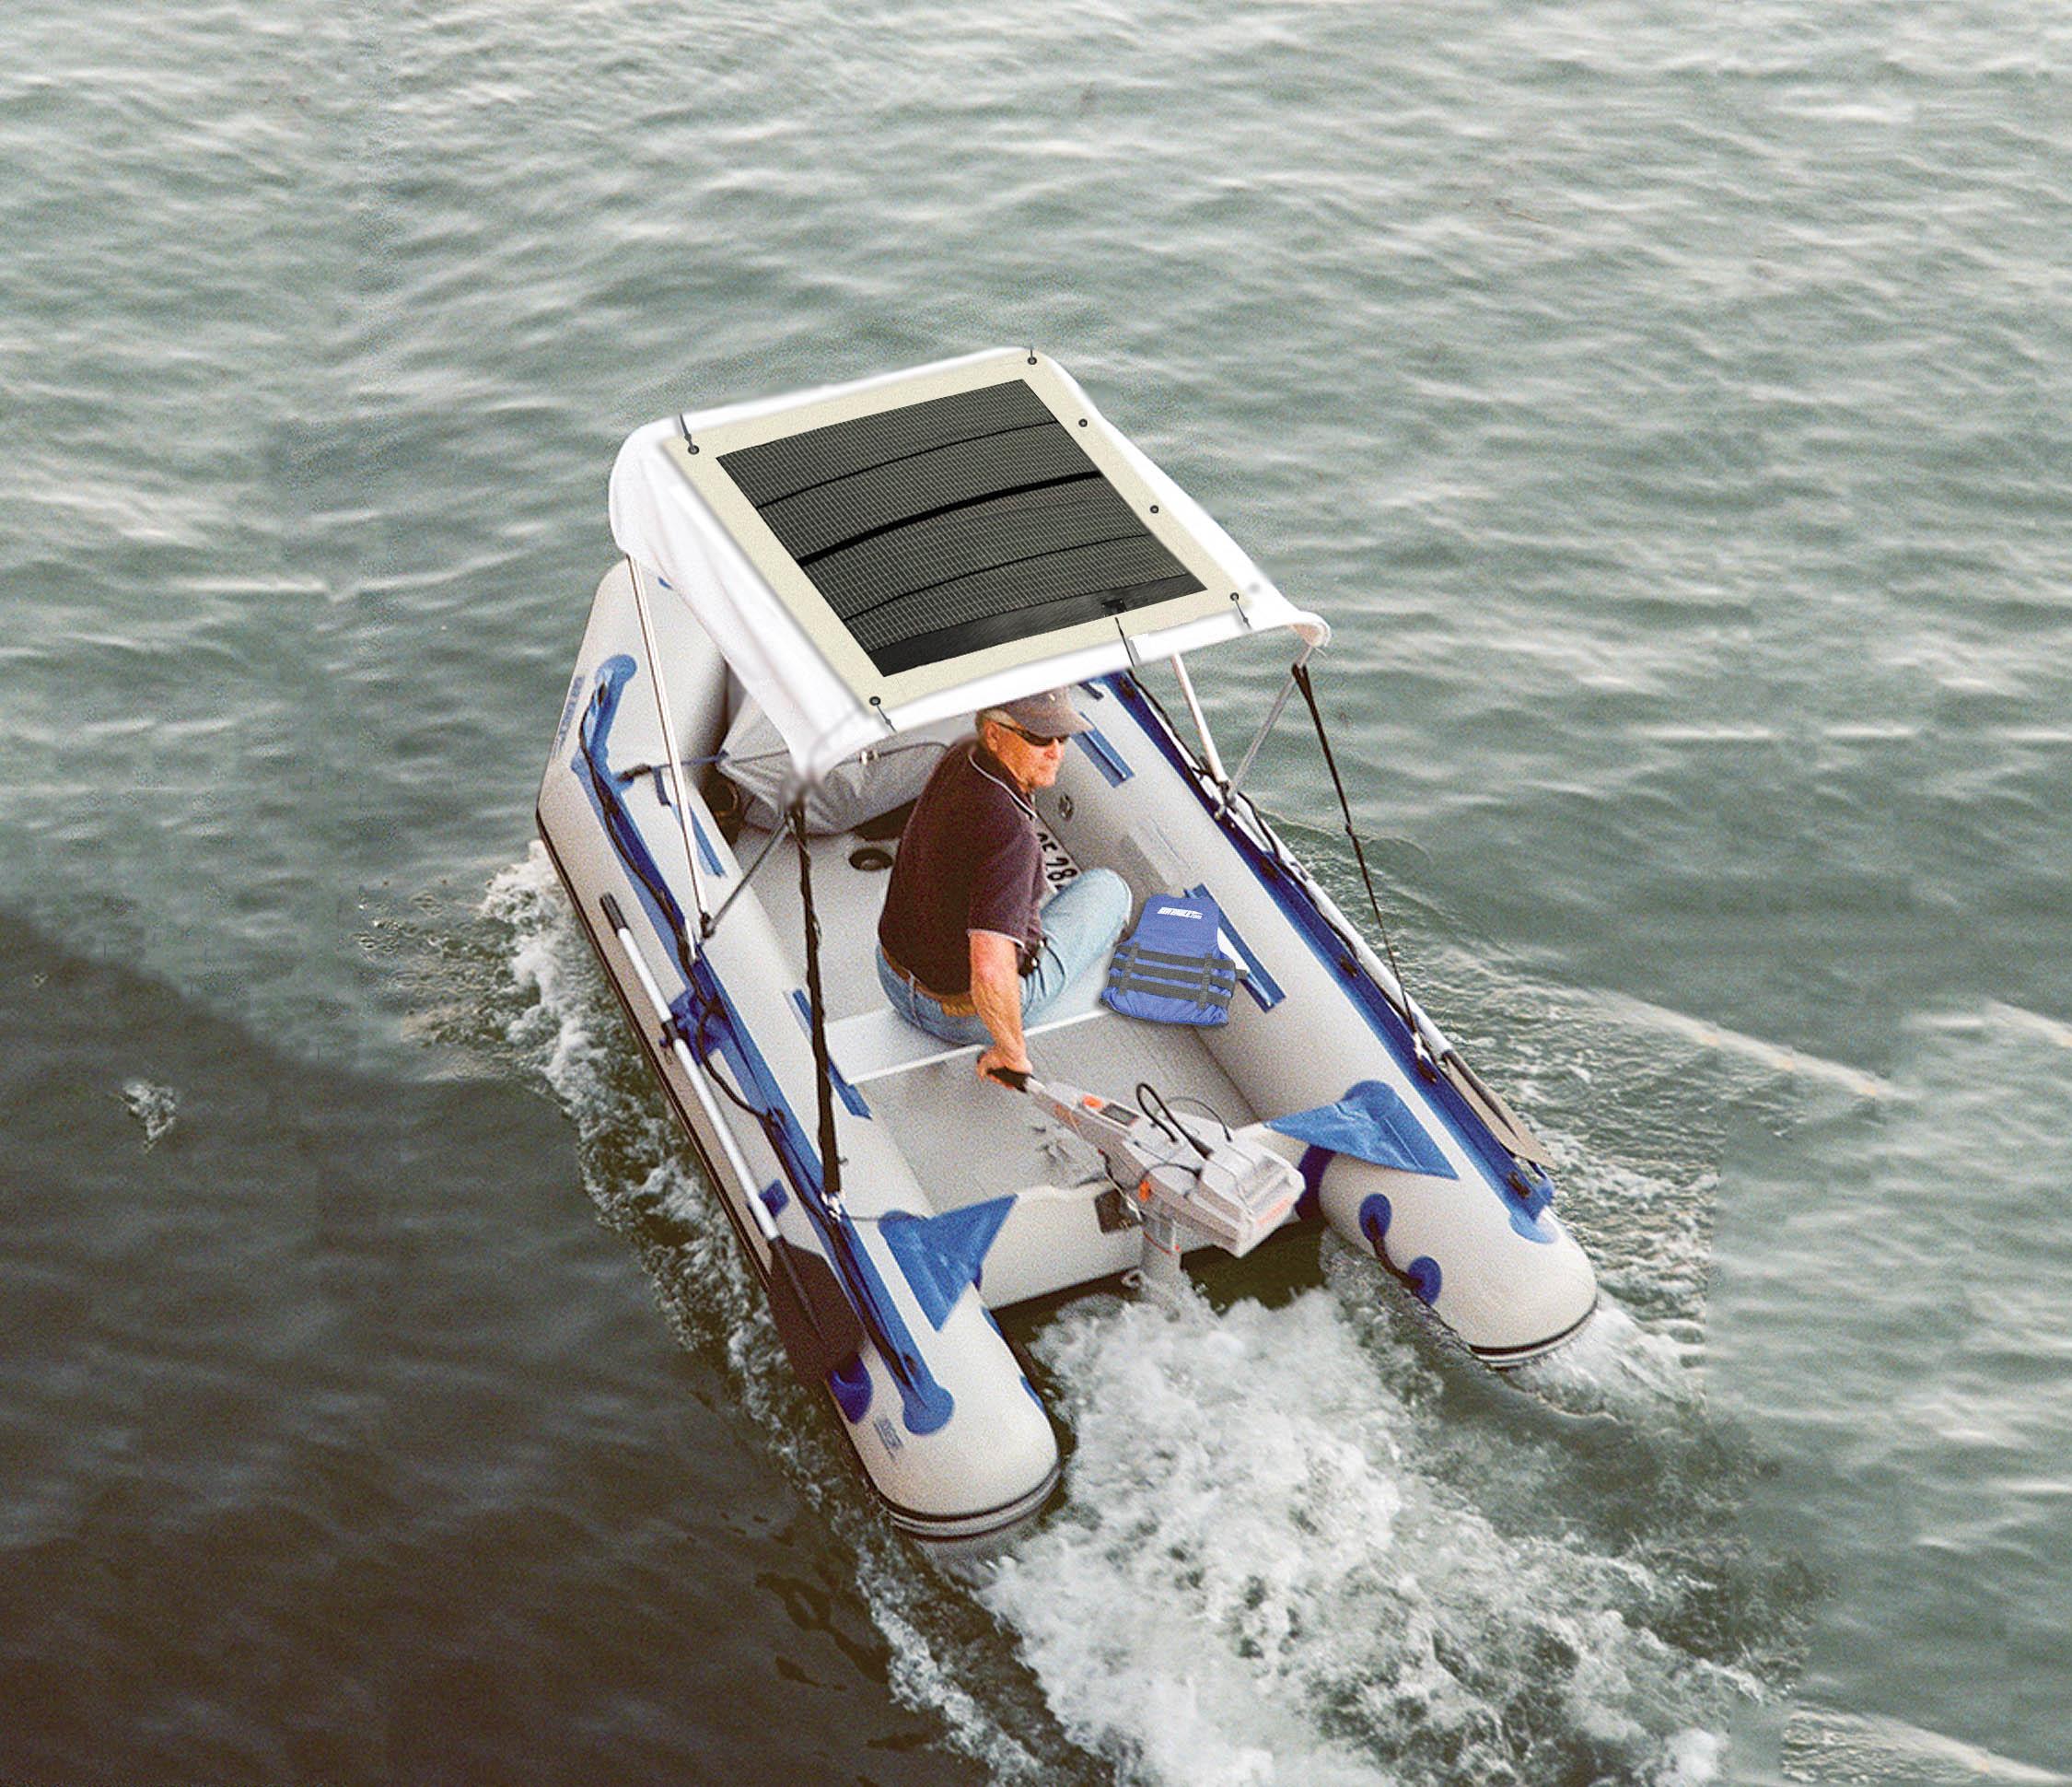 Sea Eagle 10 6 Rik With New Solar Panel Sea Eagle Inflatable Adventures